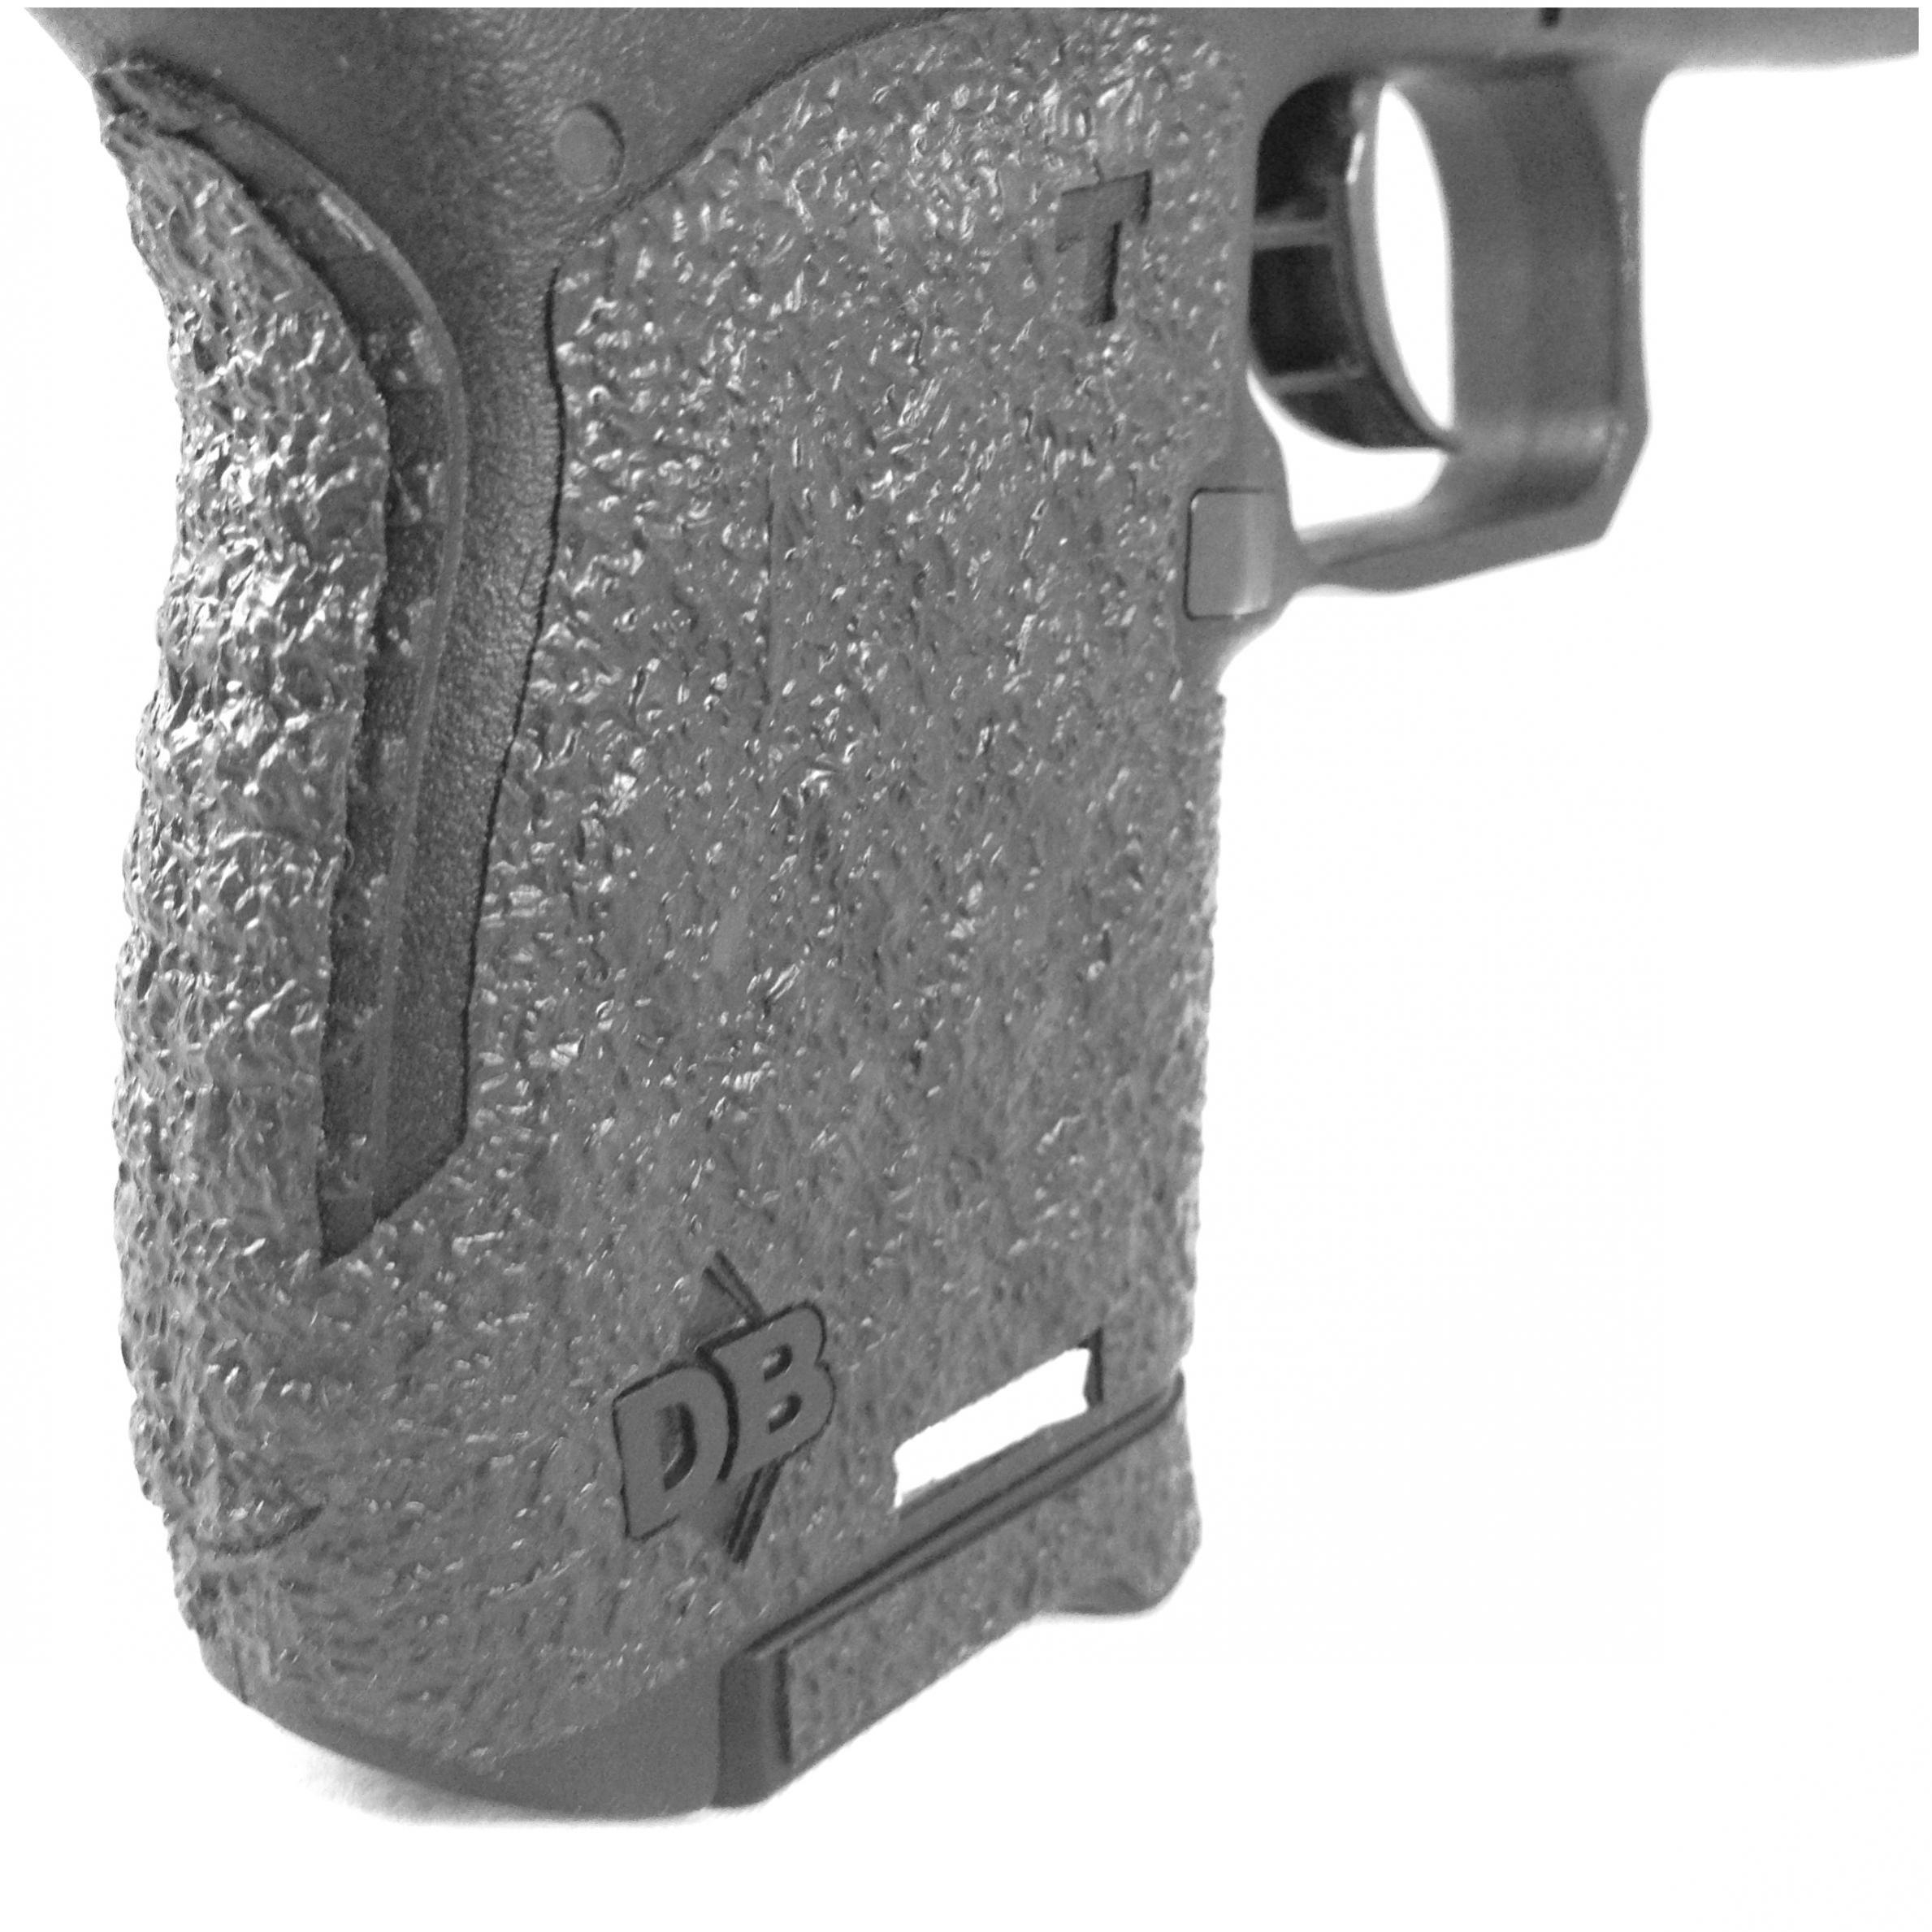 TALON Grip for Diamondback DB9-dlo1401-rubber1.jpg